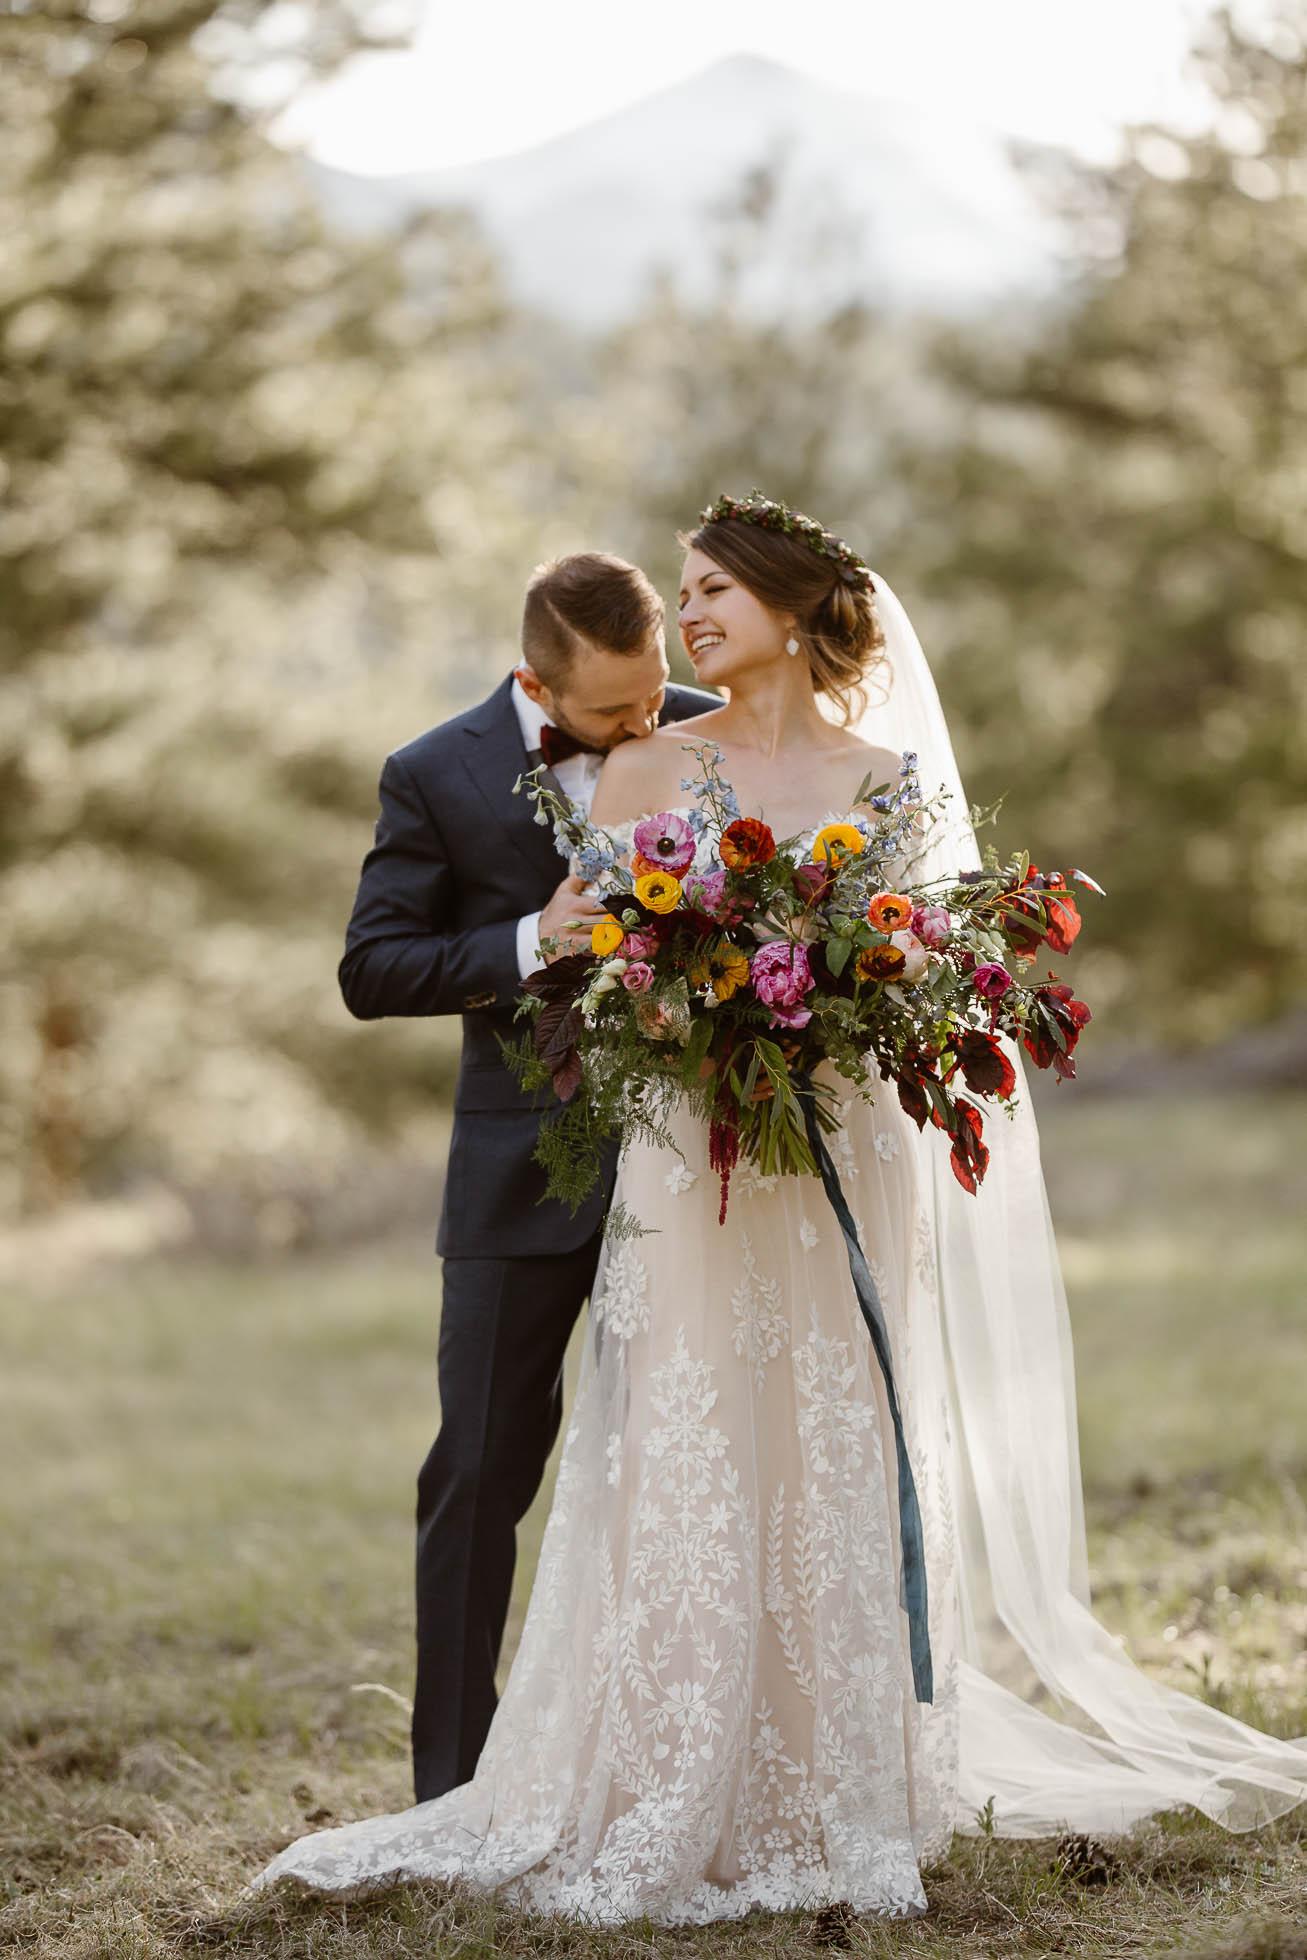 DELLA TERRA MOUNTAIN CHATEAU COLORADO WEDDING   COLORADO WEDDING PHOTOGRAPHER   ESTES PARK COLORADO WEDDING PHOTOGRAPHER